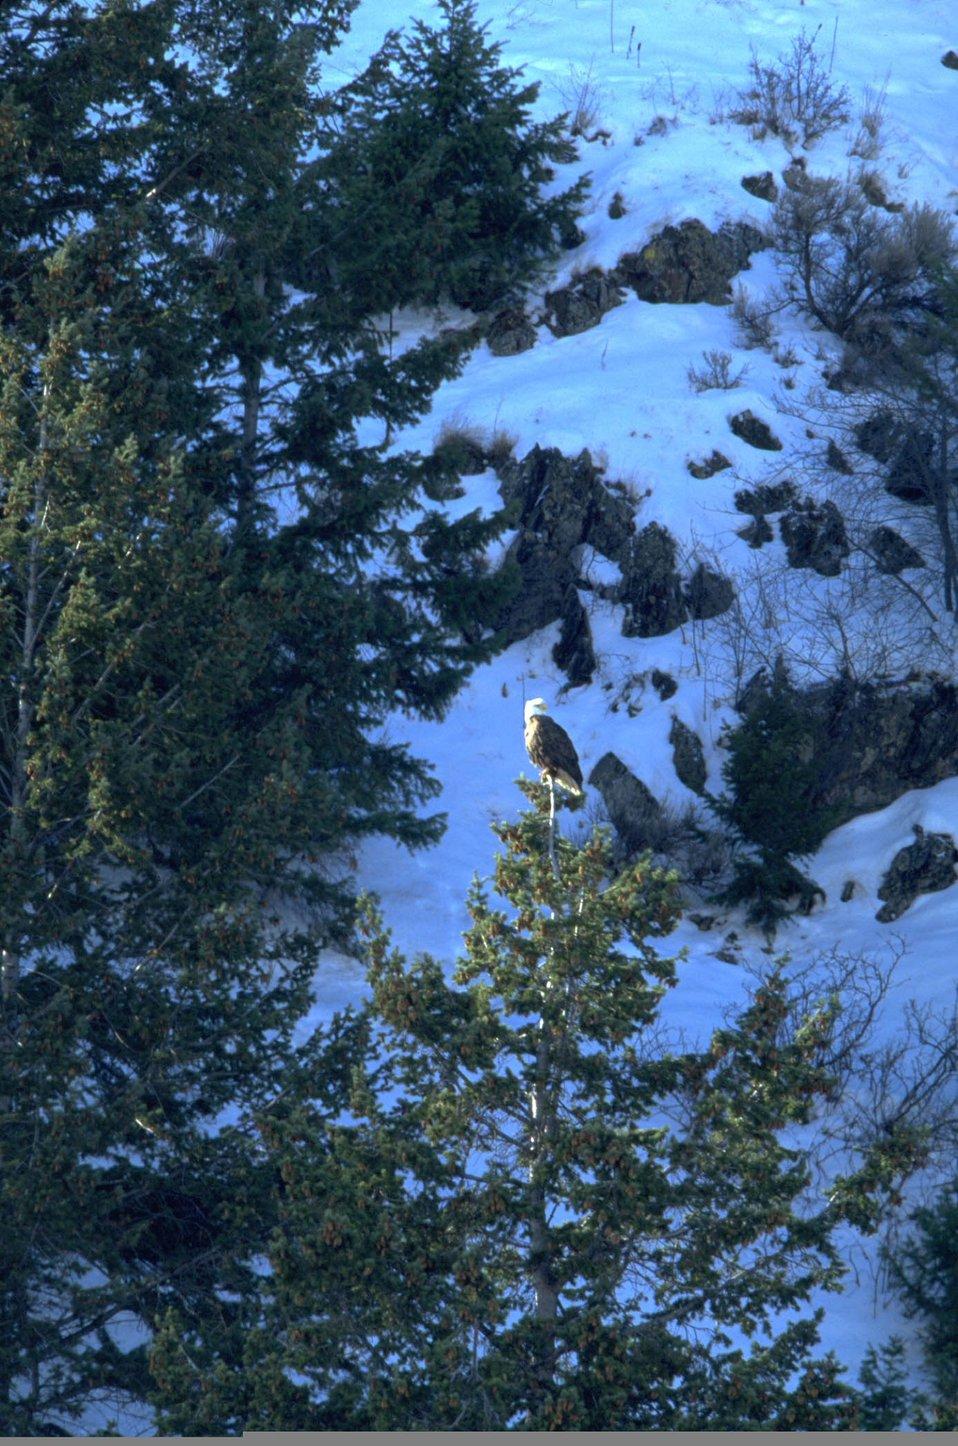 Bald eagle in trees